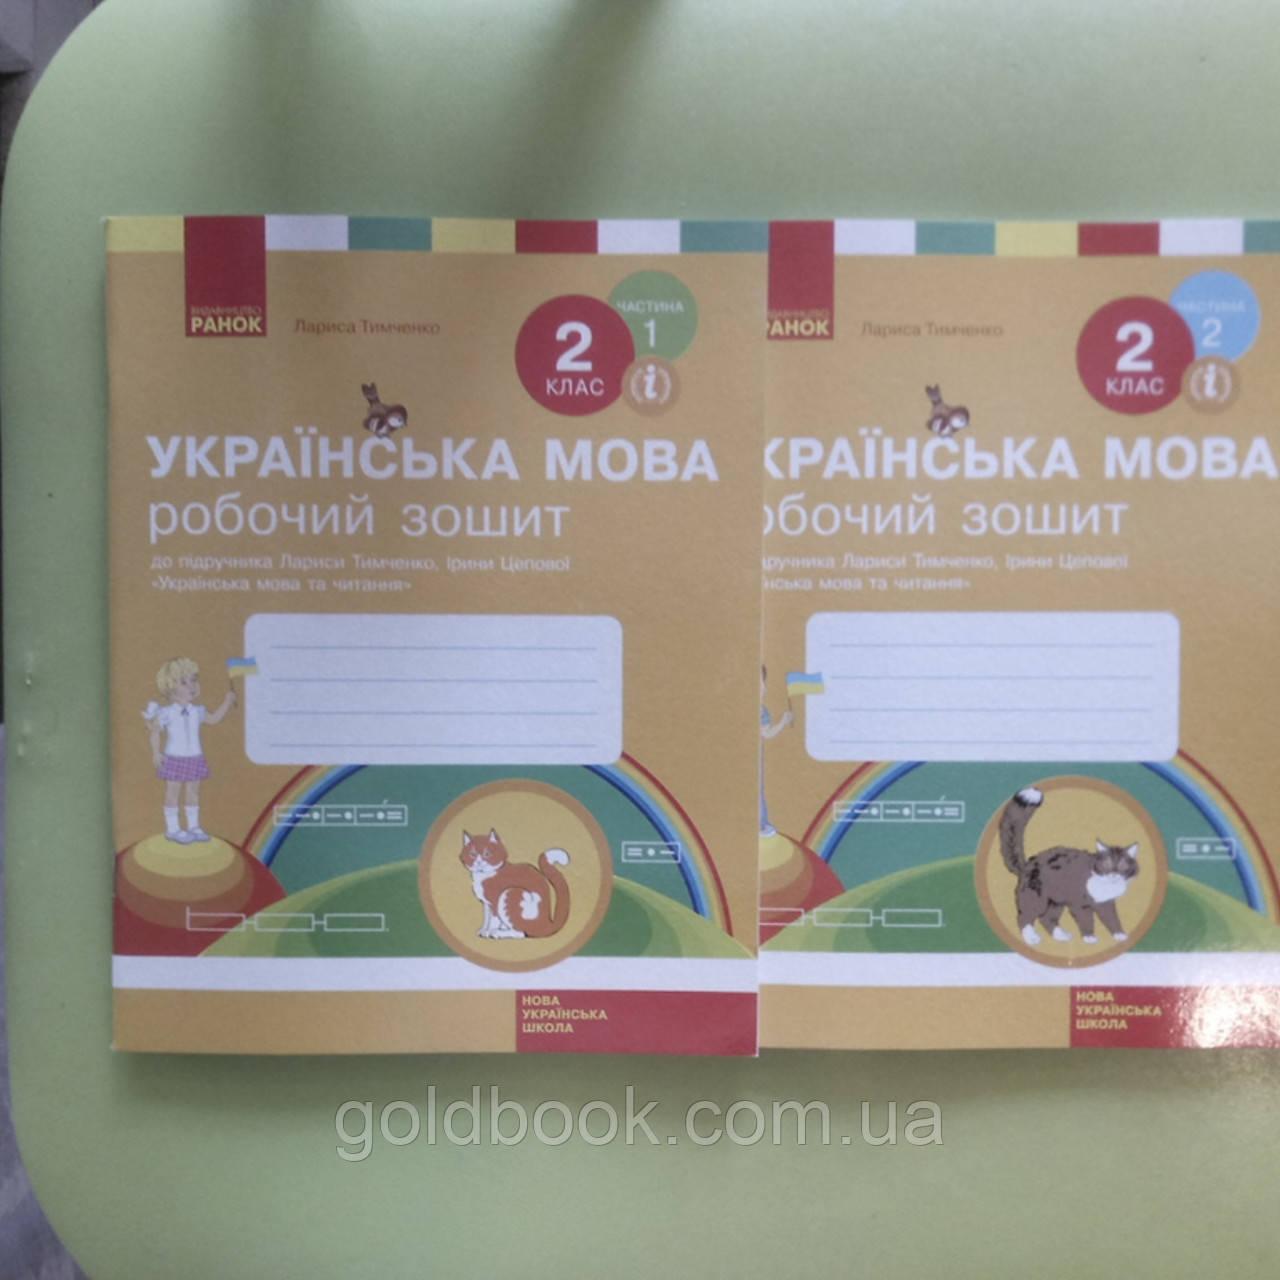 Українська мова 2 клас робочий зошит.